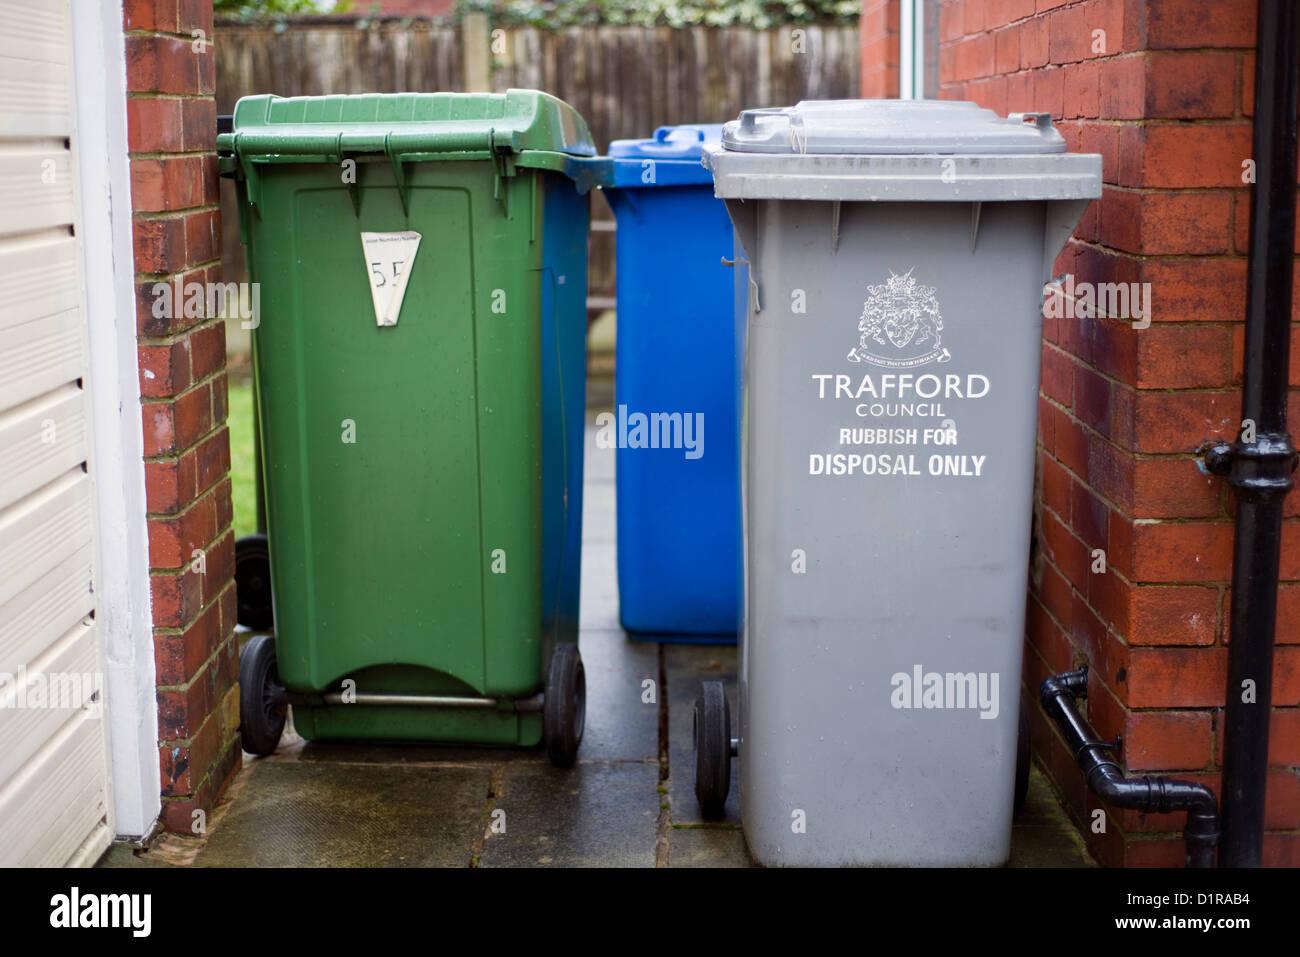 Wheelie bins in a garden in Manchester, England, UK - Stock Image